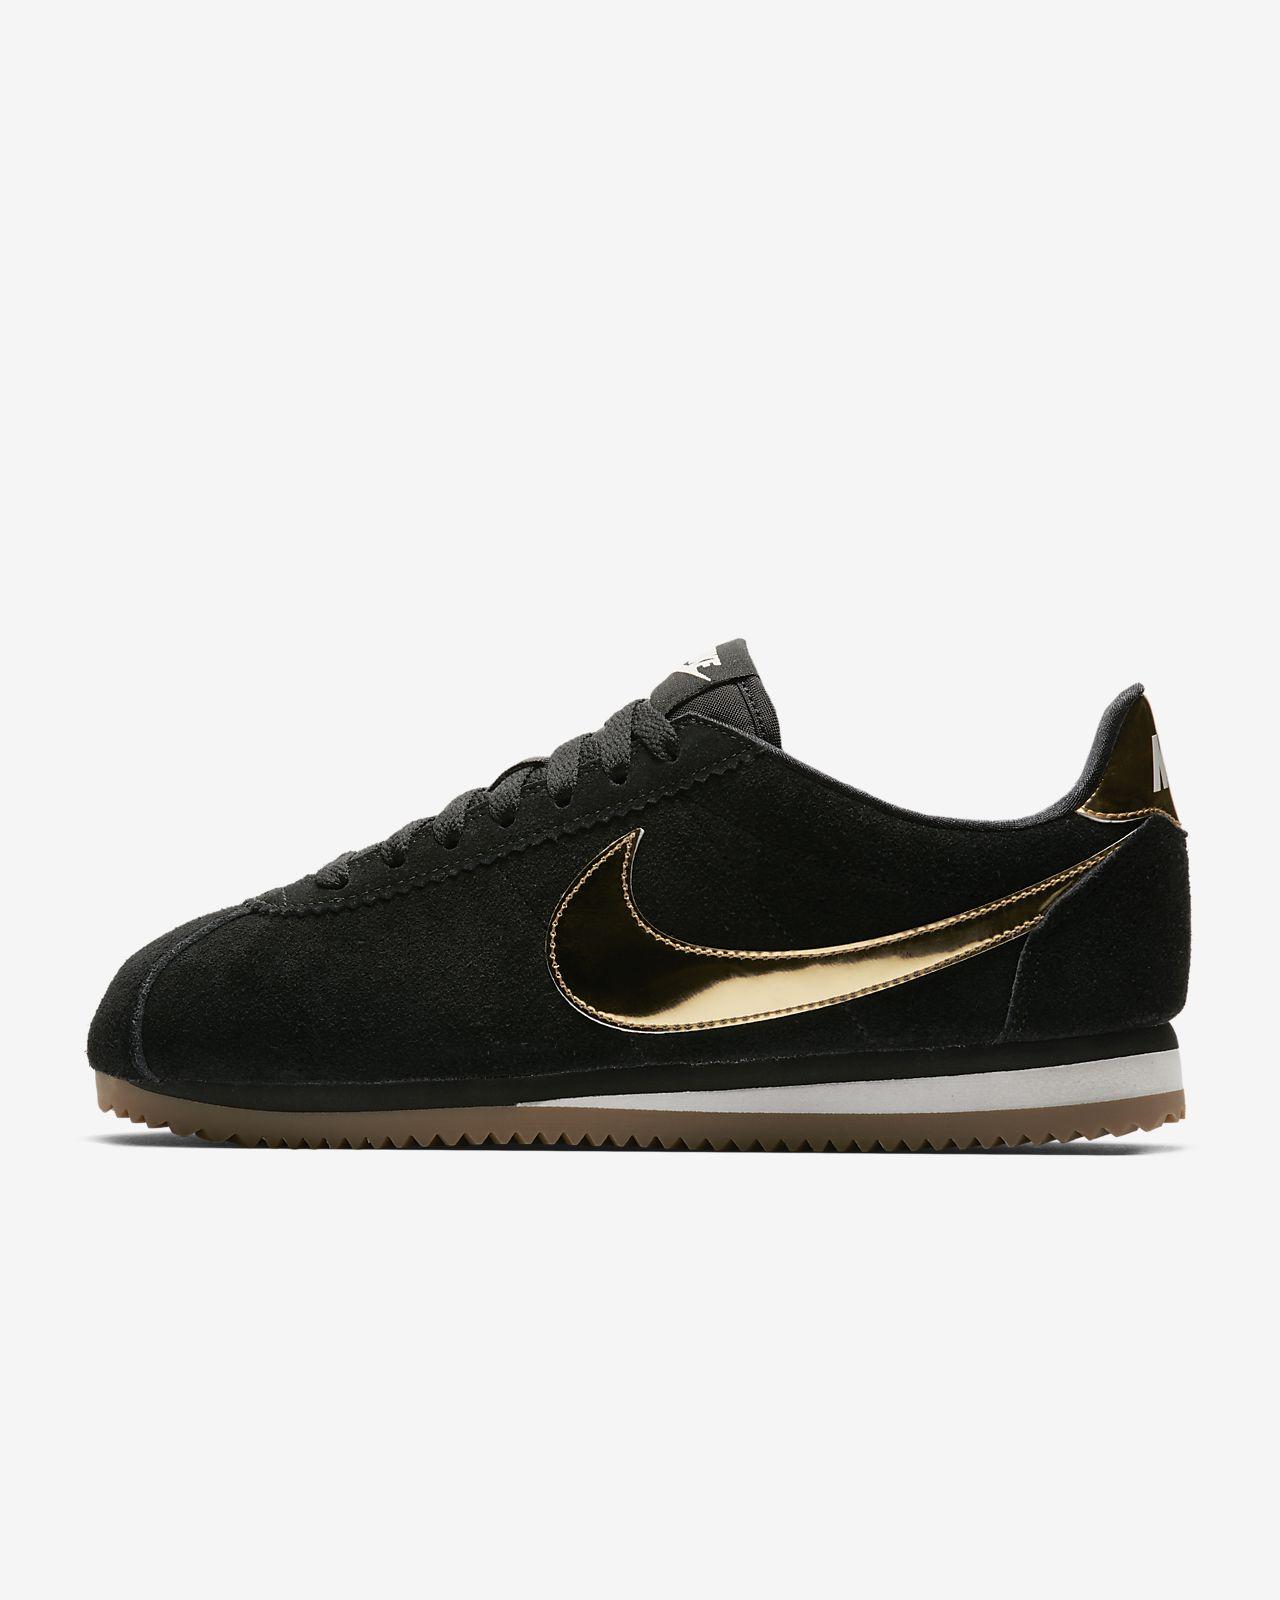 9b50a8dd16a5df Nike Cortez SE Women s Shoe. Nike.com EG